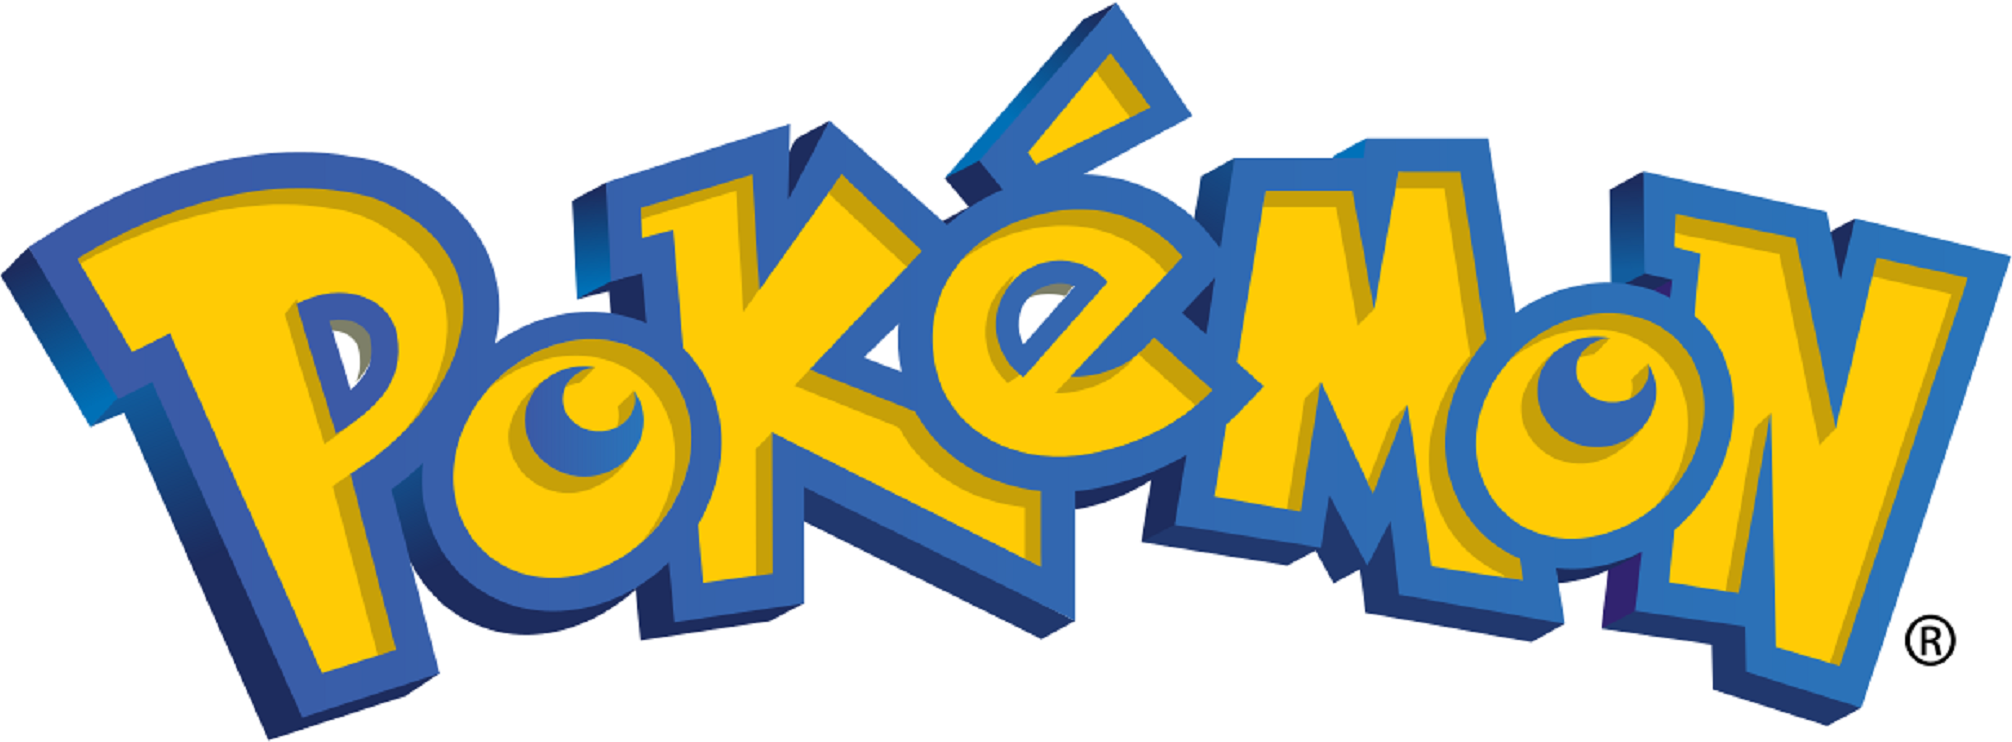 Pokémon Inc.